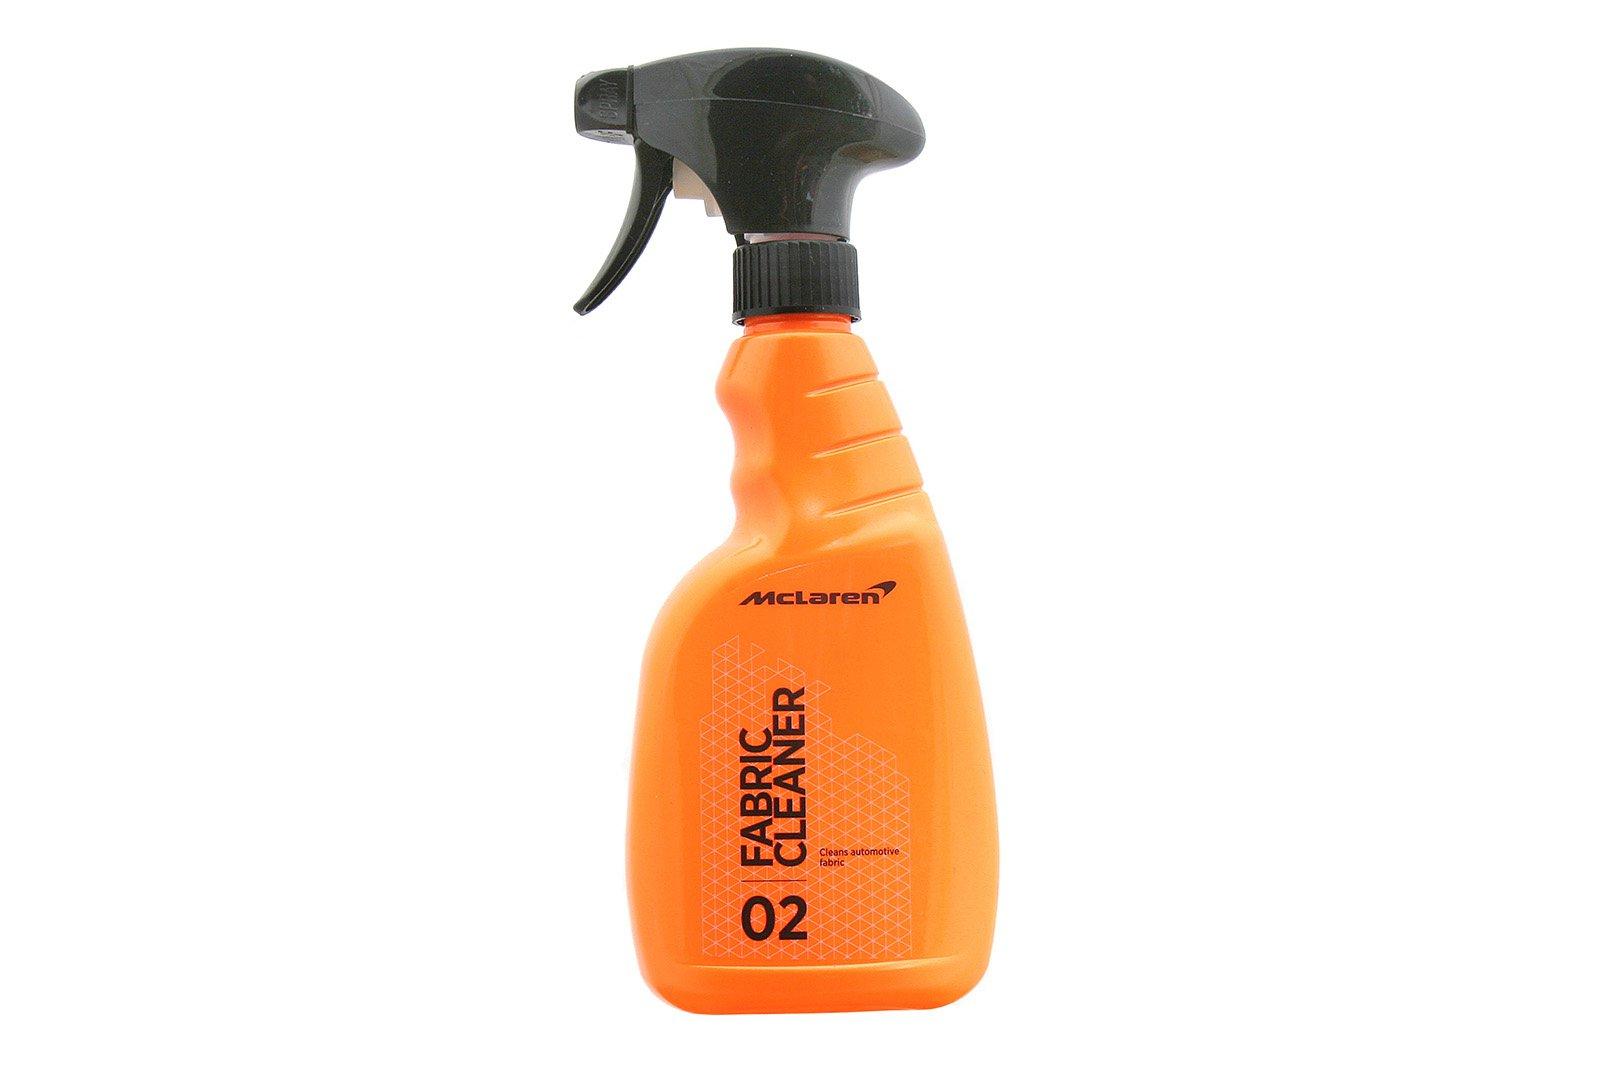 Limpador de estofados McLaren